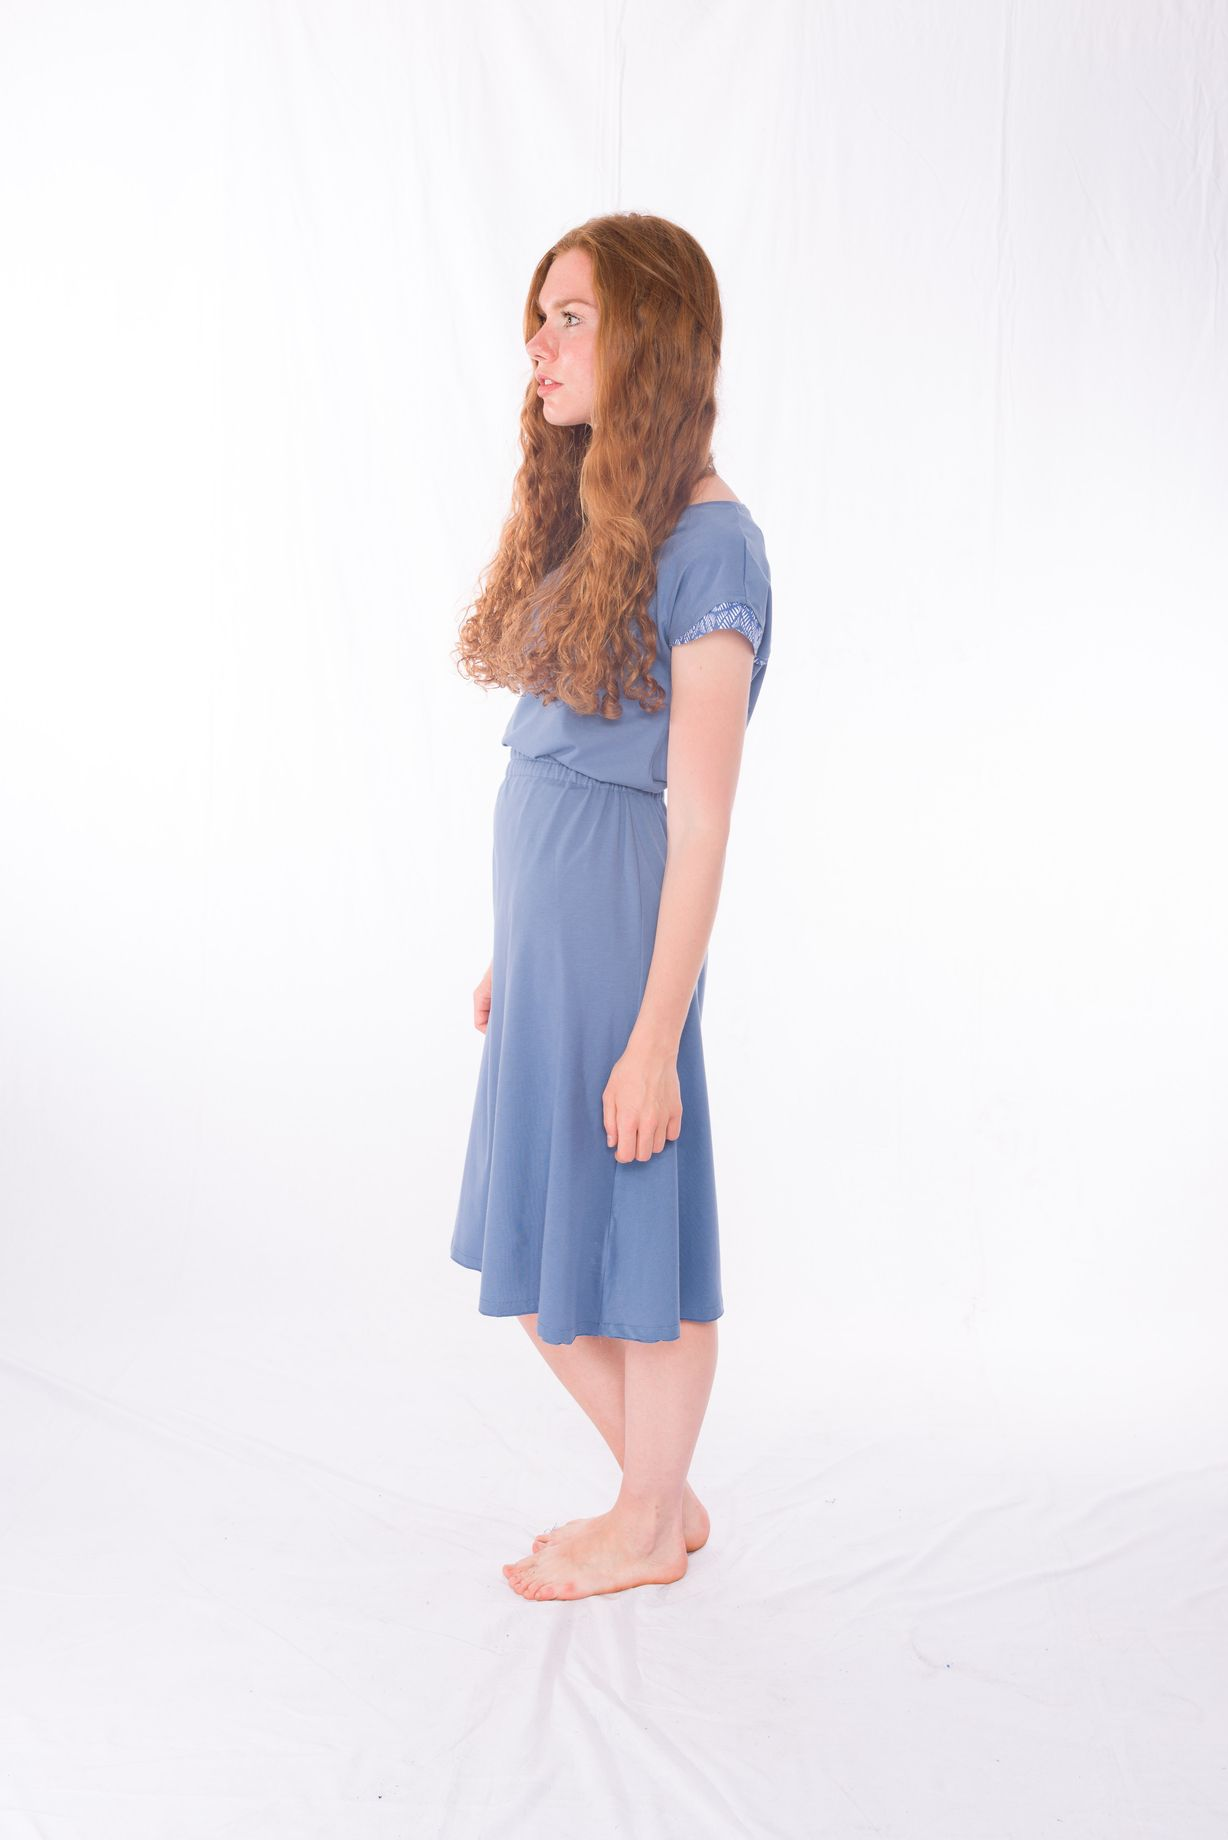 Shirt Blueleaves _ Jersey-Rock Midi Blue